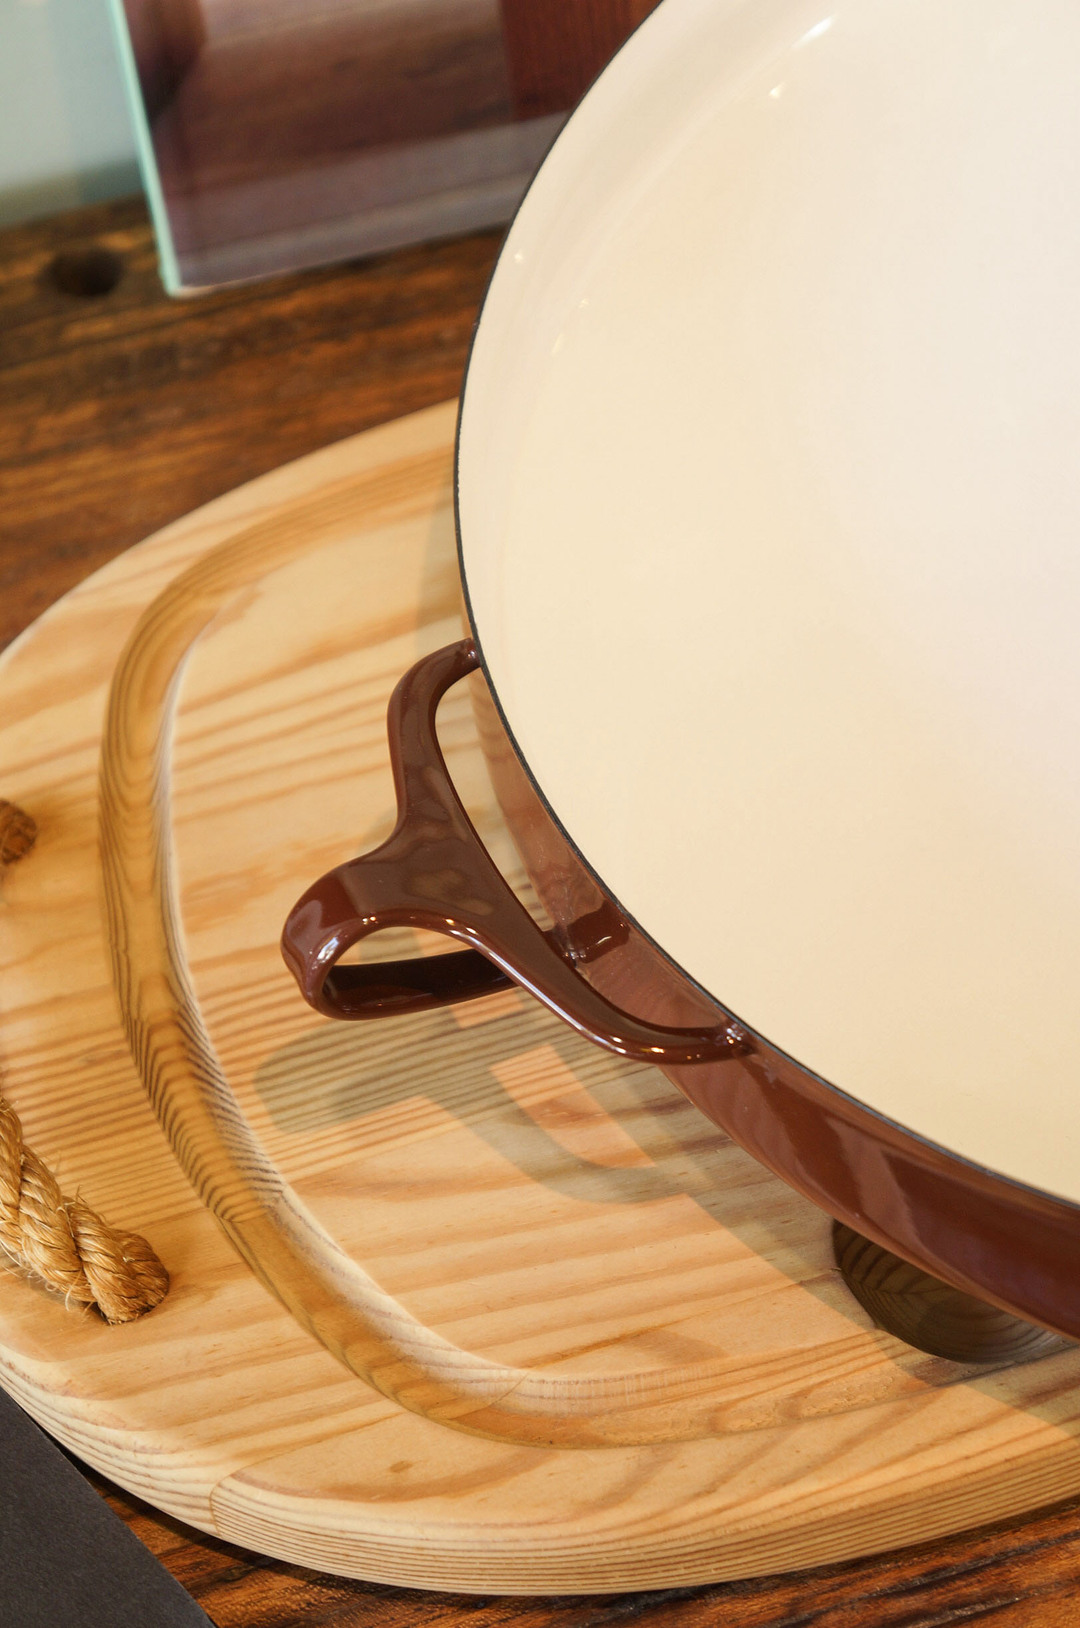 Dansk Kobenstyle Vintage Paella Pan/ダンスク コベンスタイル ヴィンテージ パエリア鍋 ブラウン イェンス・クイストゴー